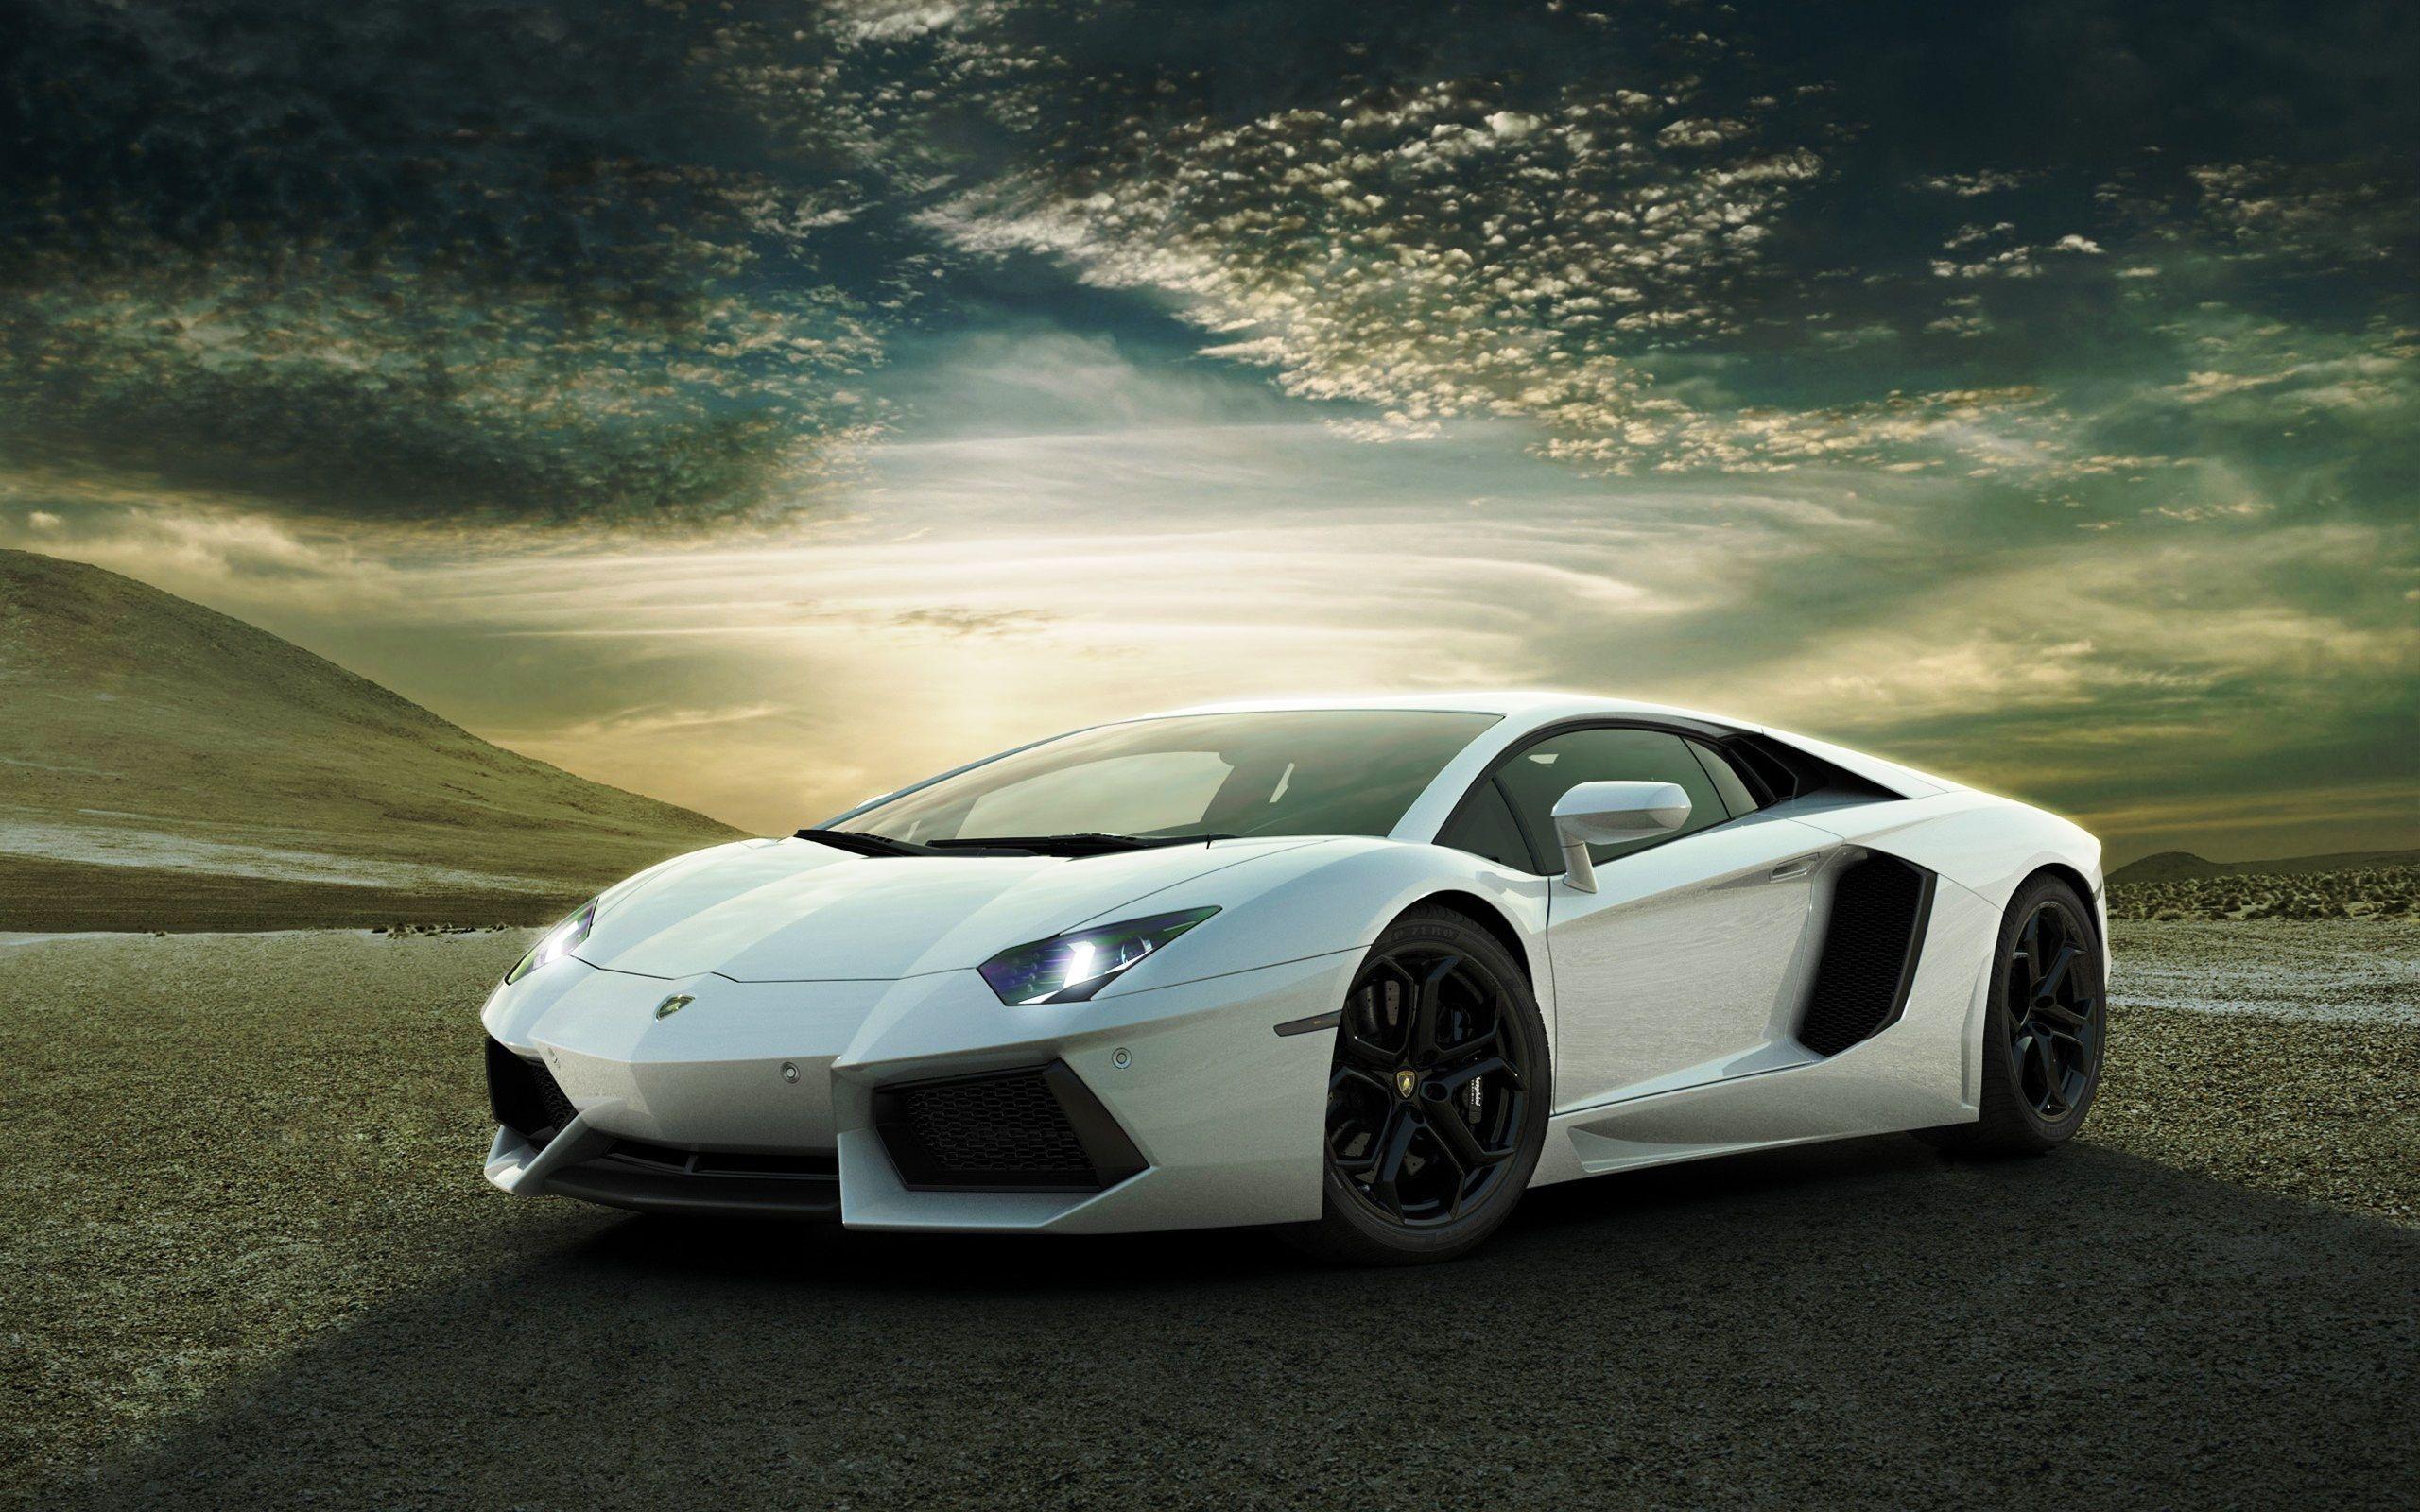 Lamborghini Car Hd Wallpapers Wallpaper Cave